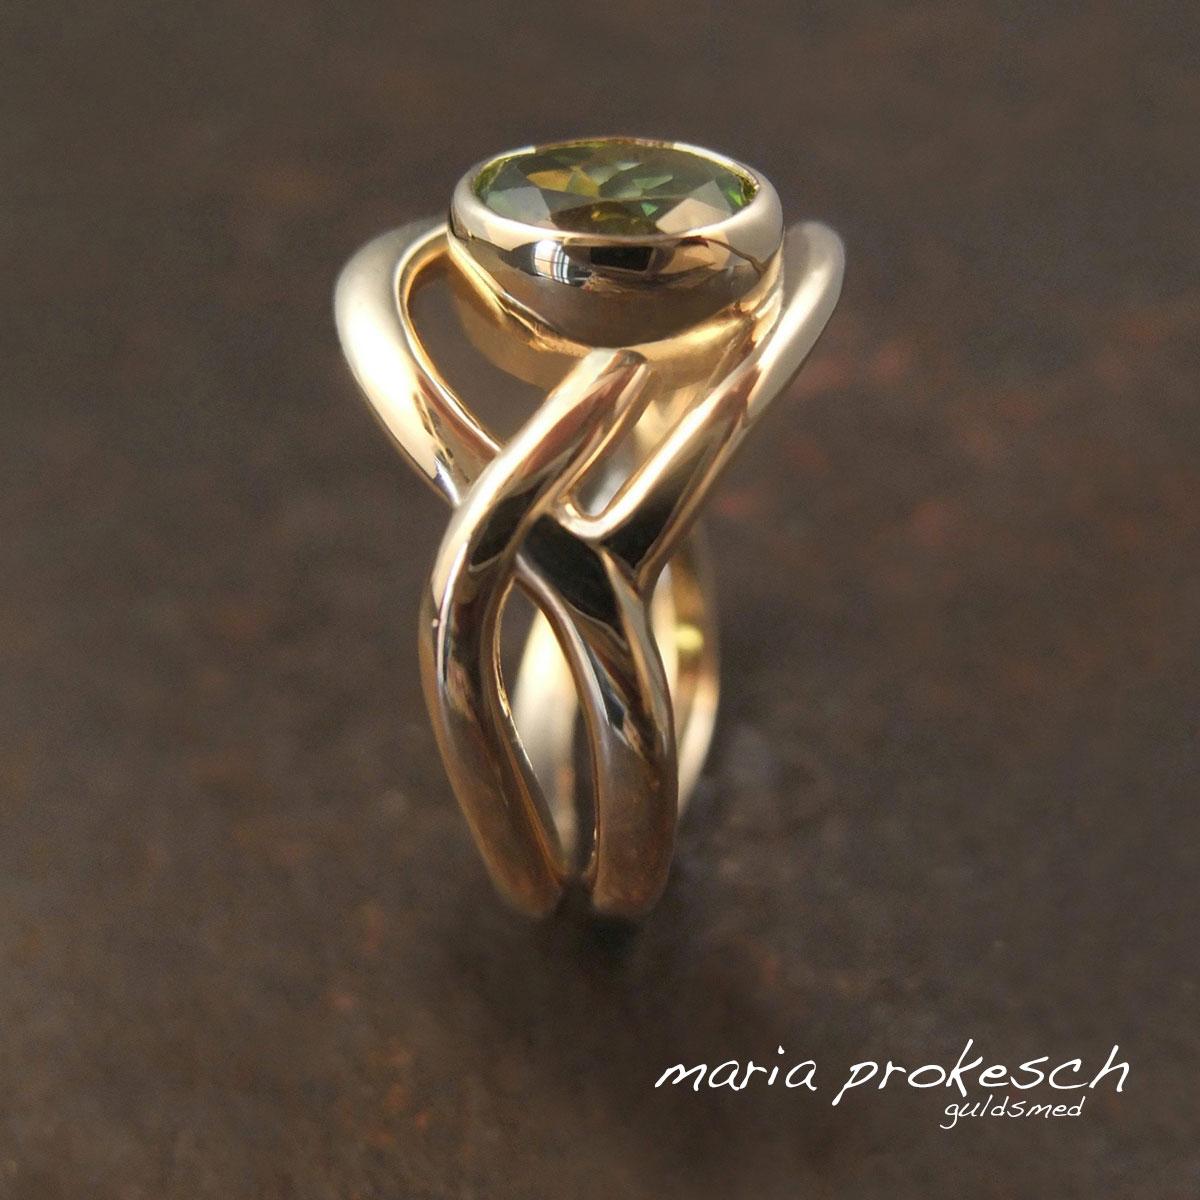 Damering i guld med blanke guldtråde som asymmetrisk buer rundt omkring grøn peridot